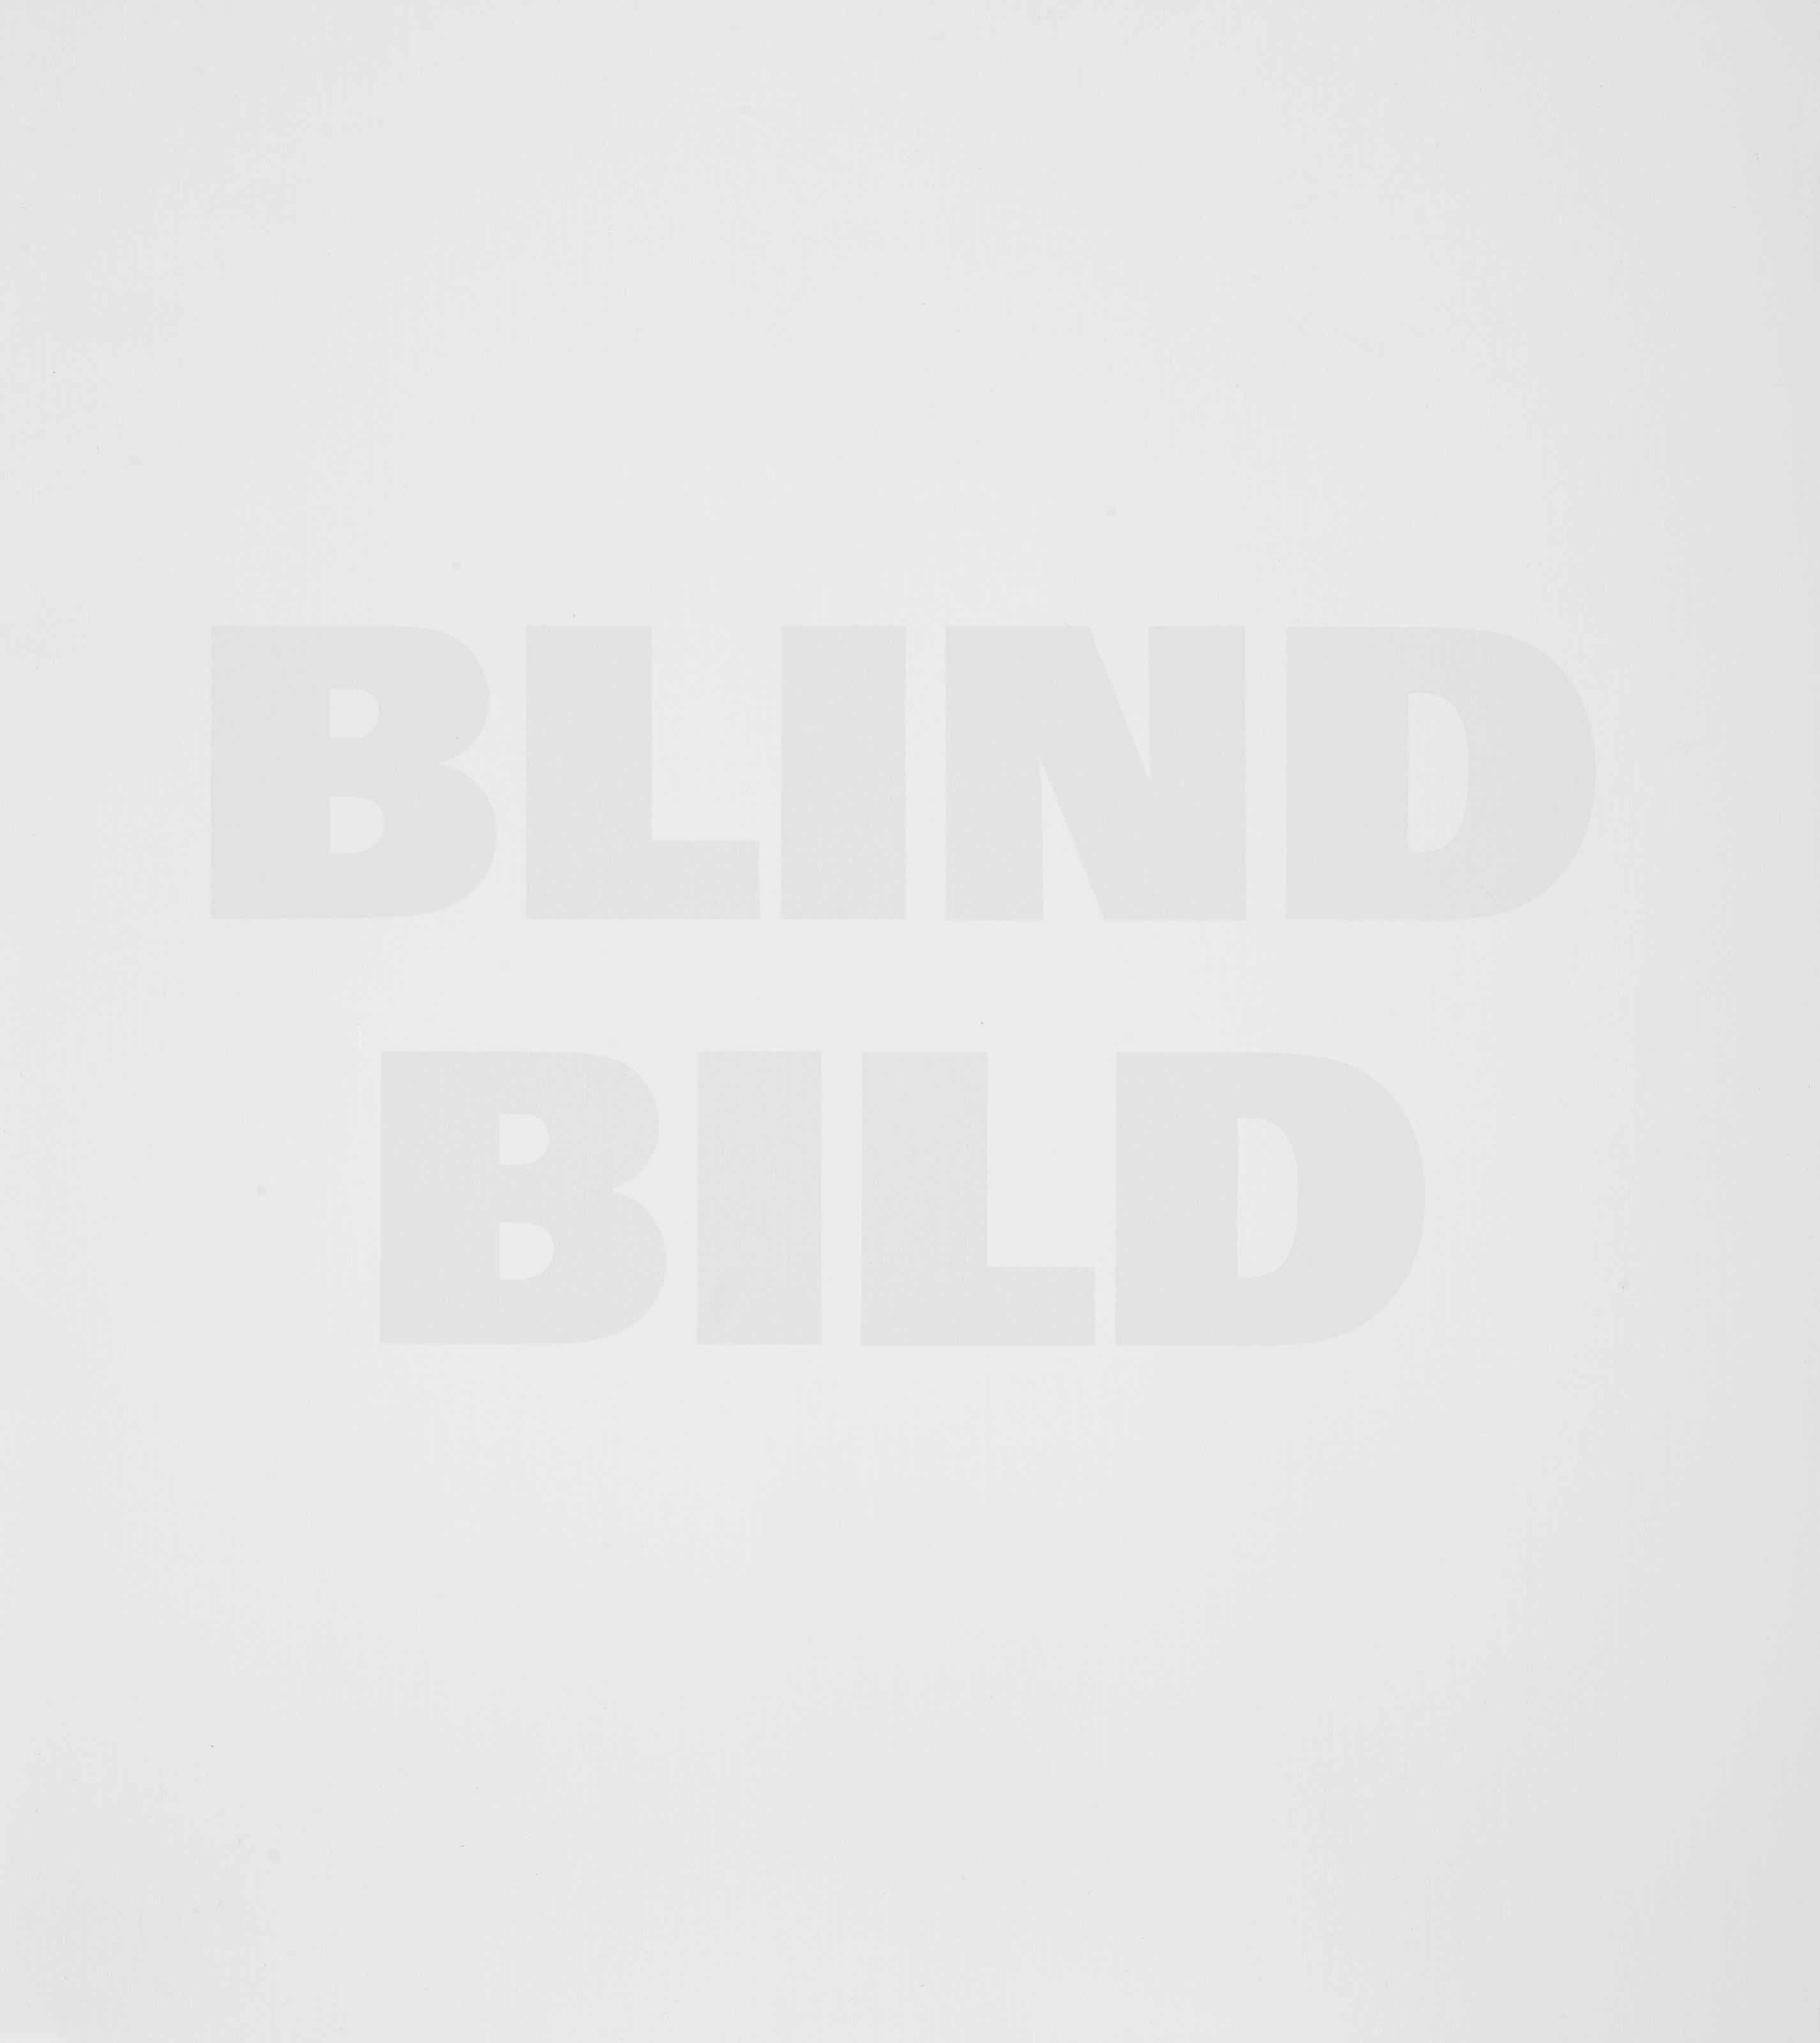 Blind Bild, 1992